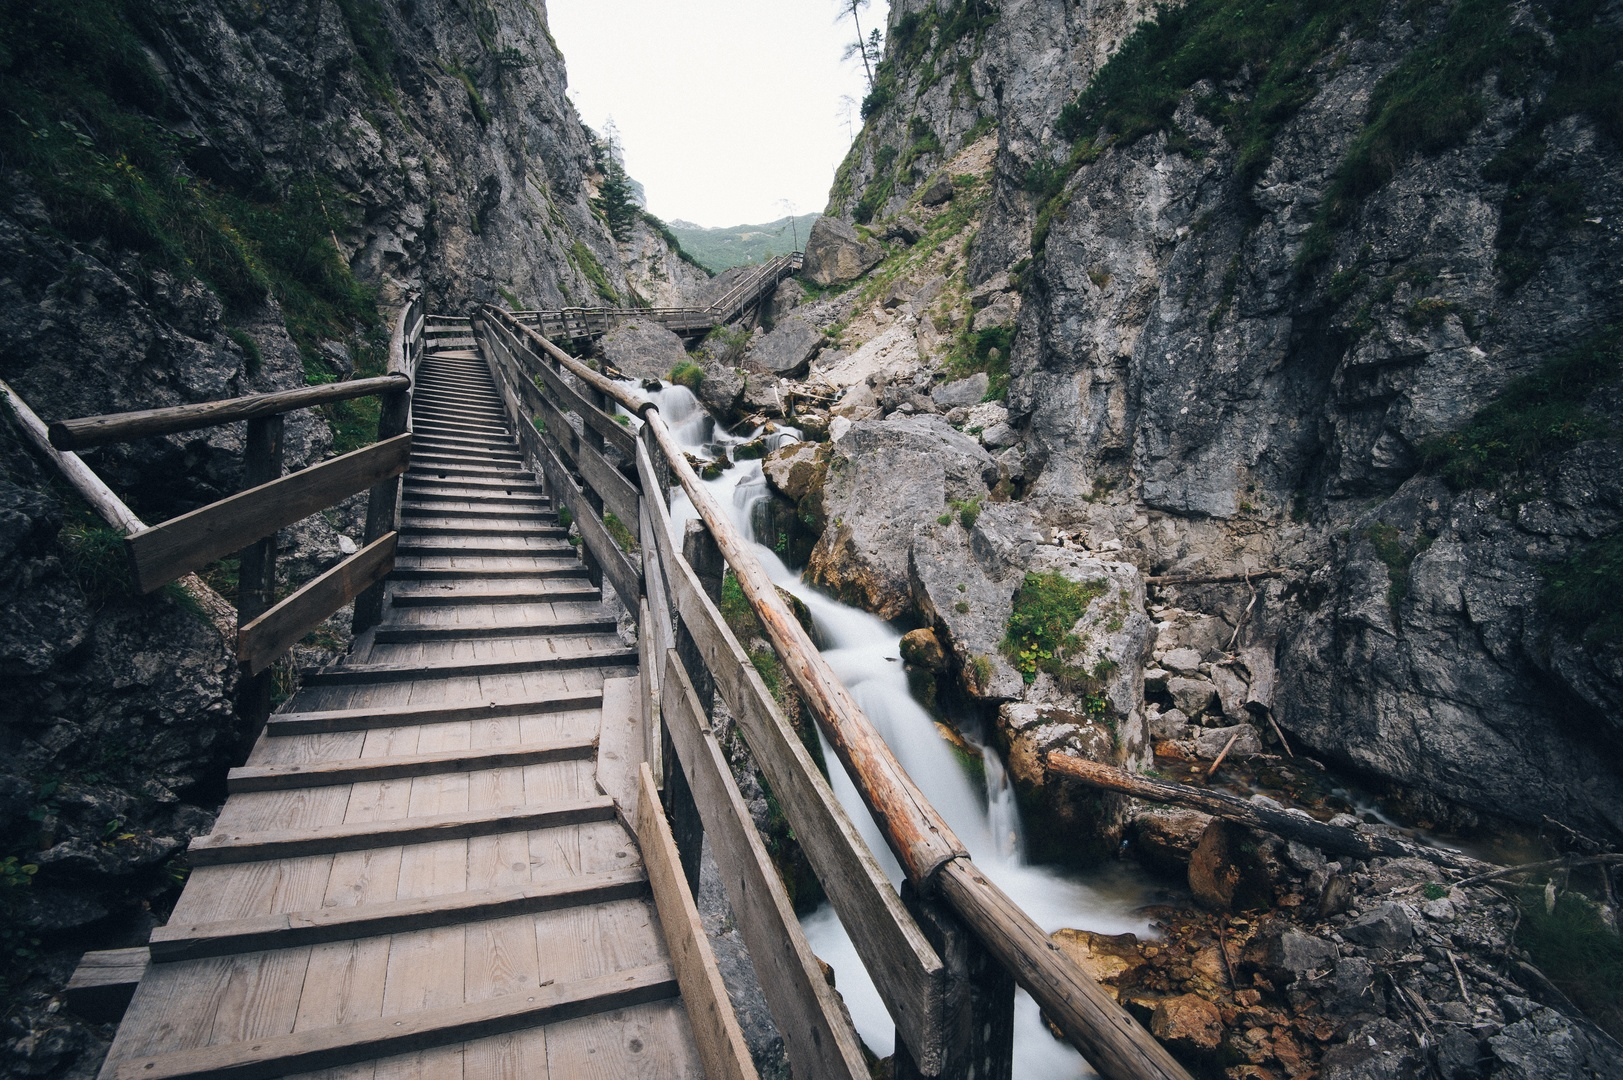 water-rock-fence-track-bridge-river-30663-pxhere.com